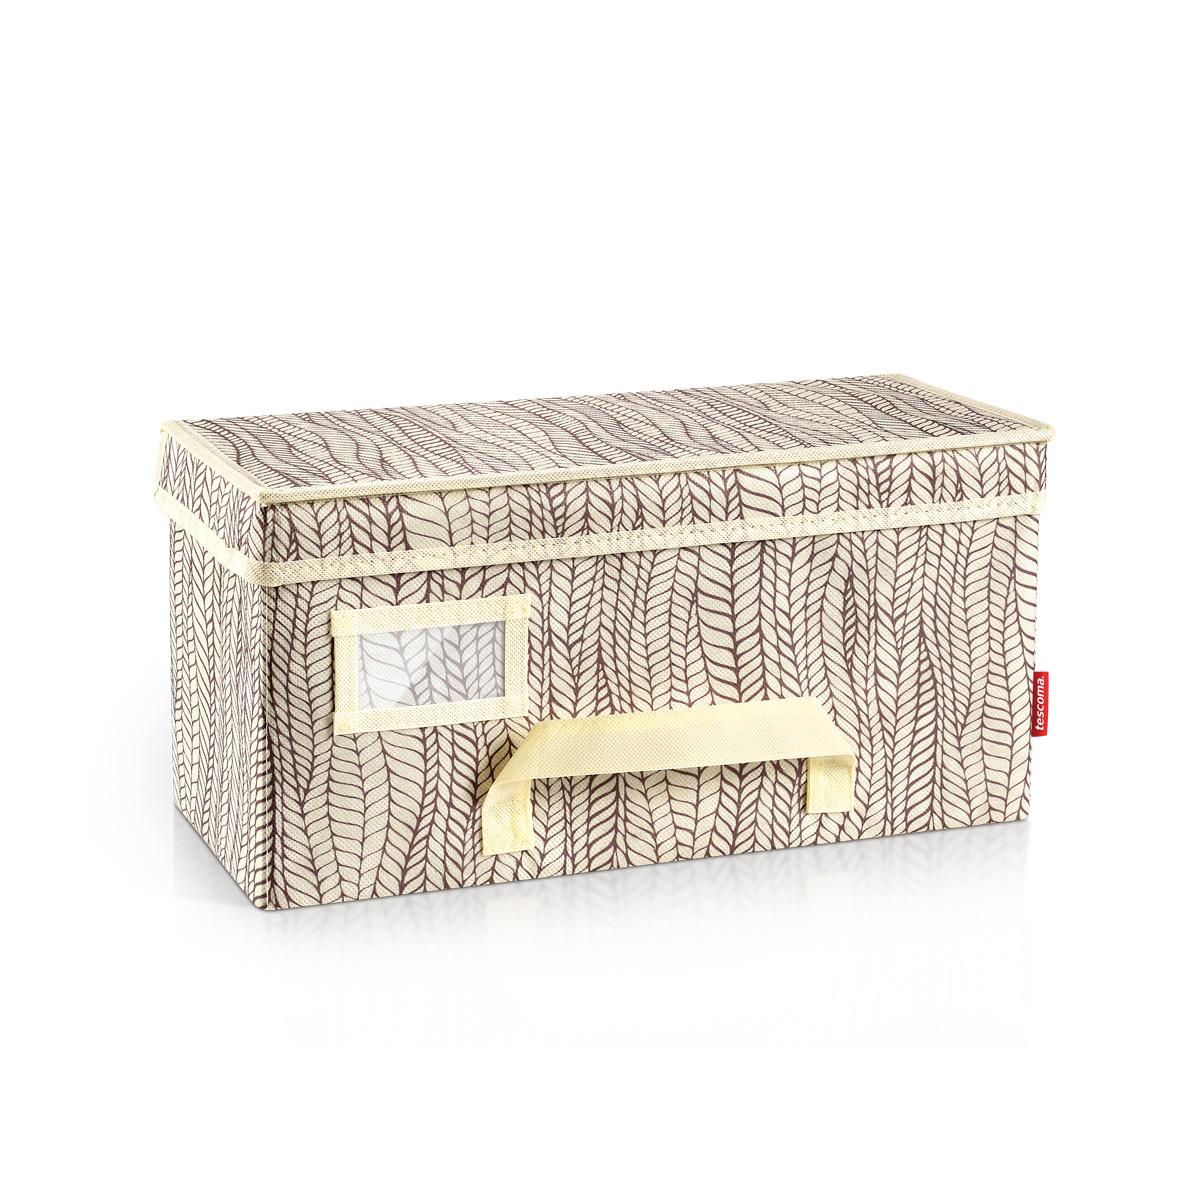 Krabice na oděvy FANCY HOME 40 x 18 x 20 cm